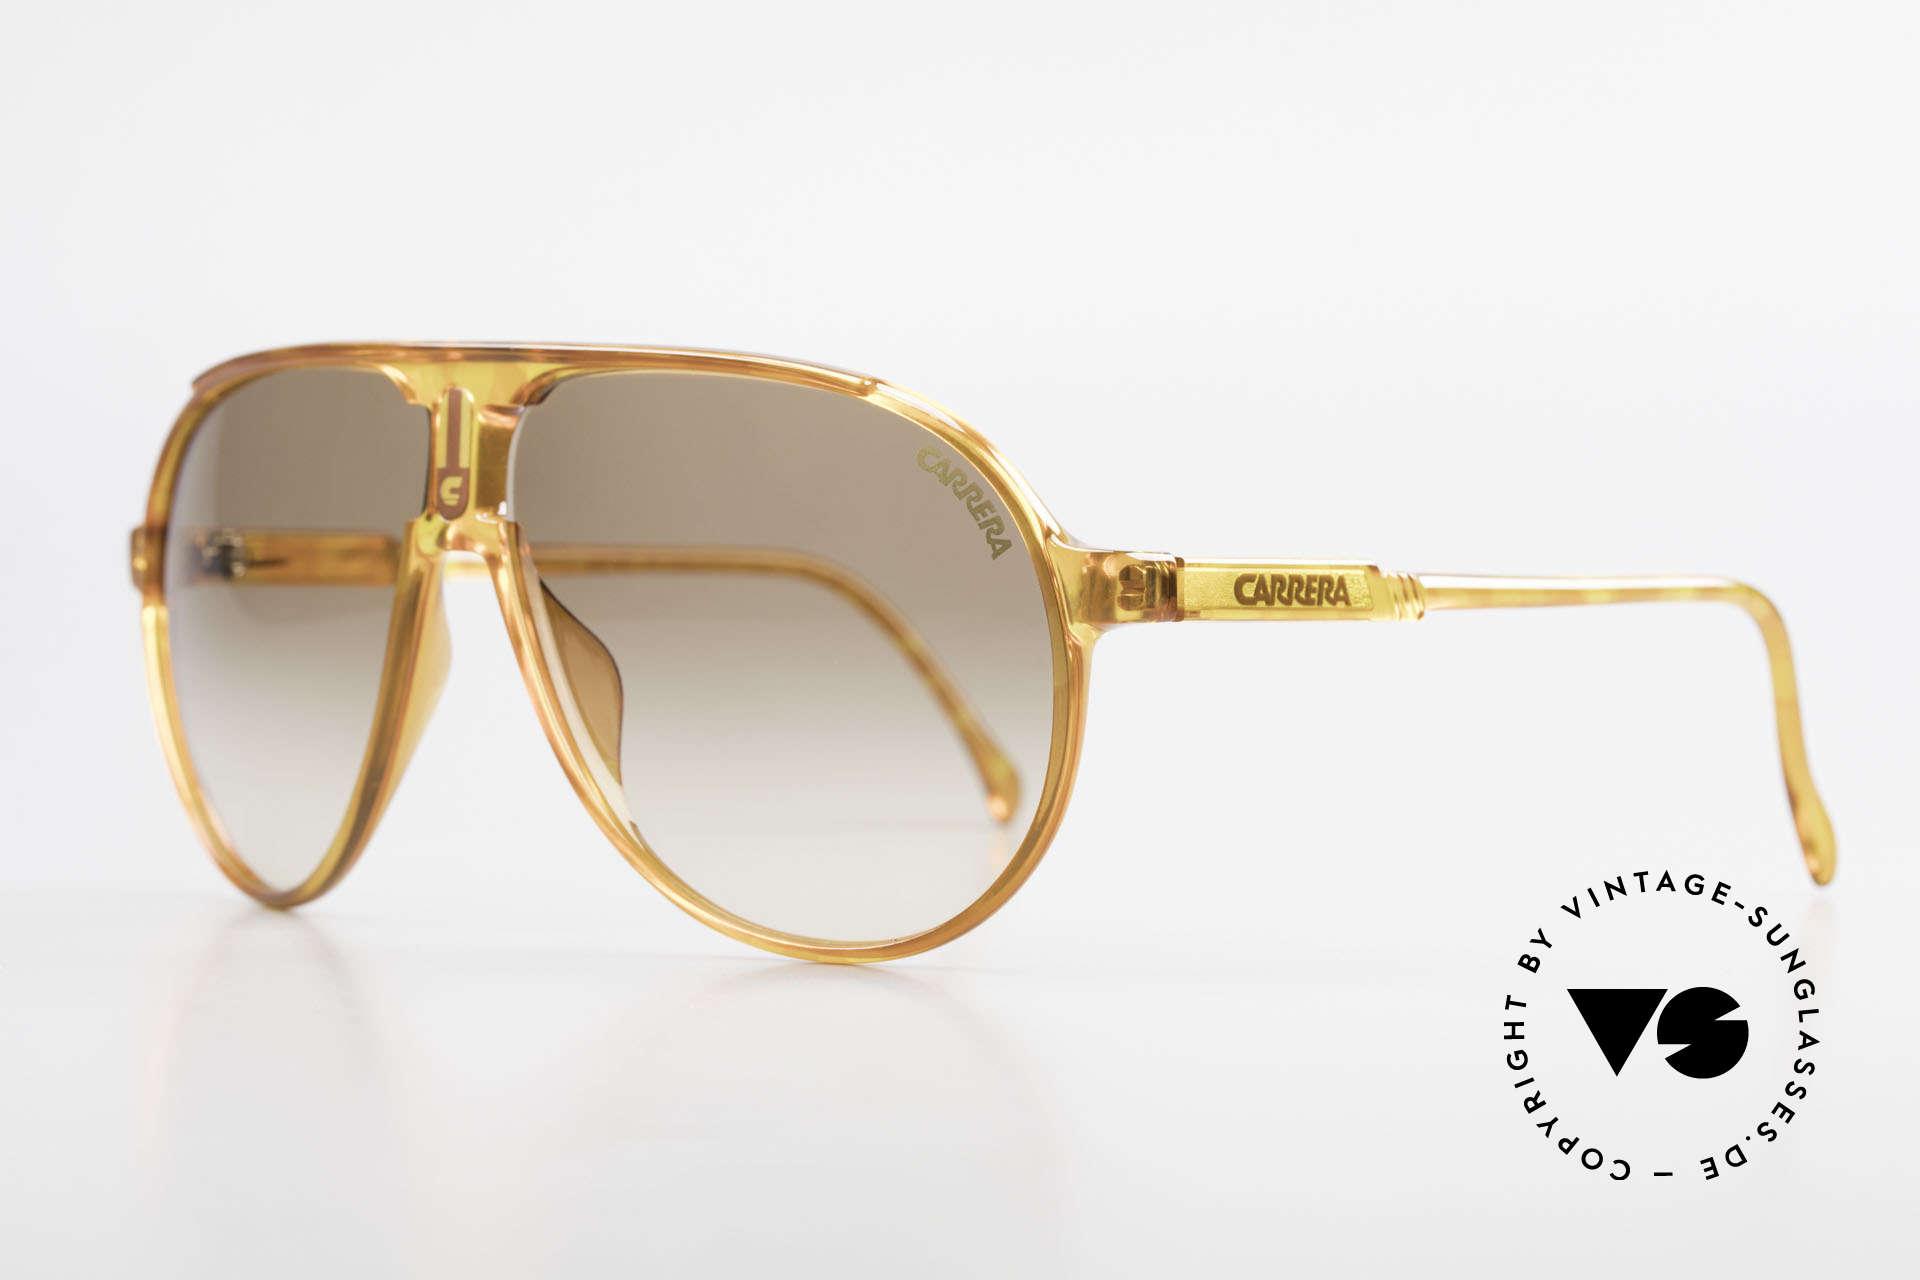 Carrera 5407 80's Sports Aviator Sunglasses, sturdy, durable, lightweight plastic frame; Optyl, Made for Men